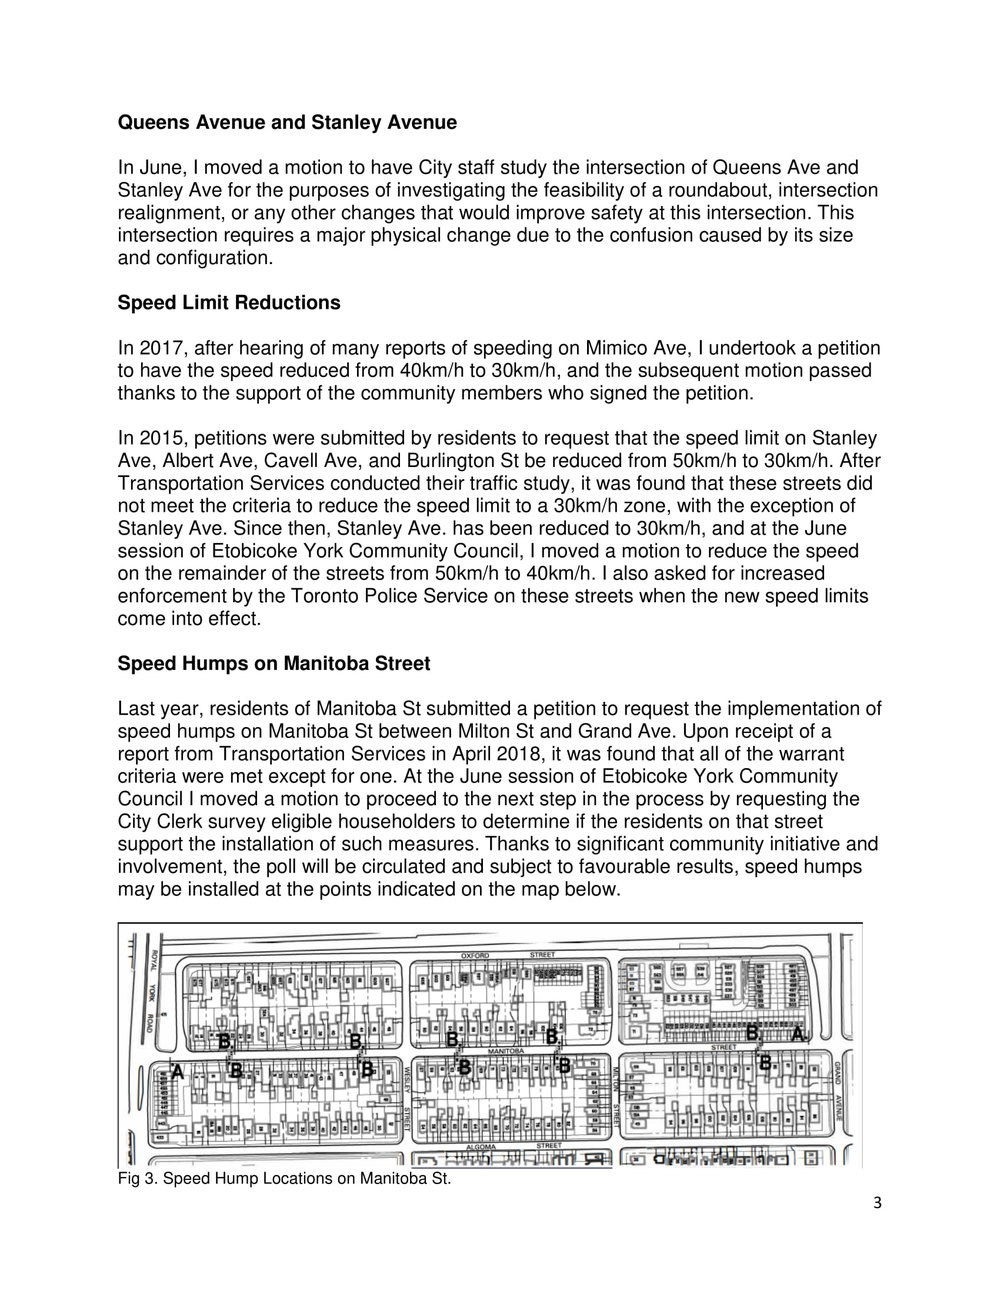 Response to MRA FINAL-3.jpg